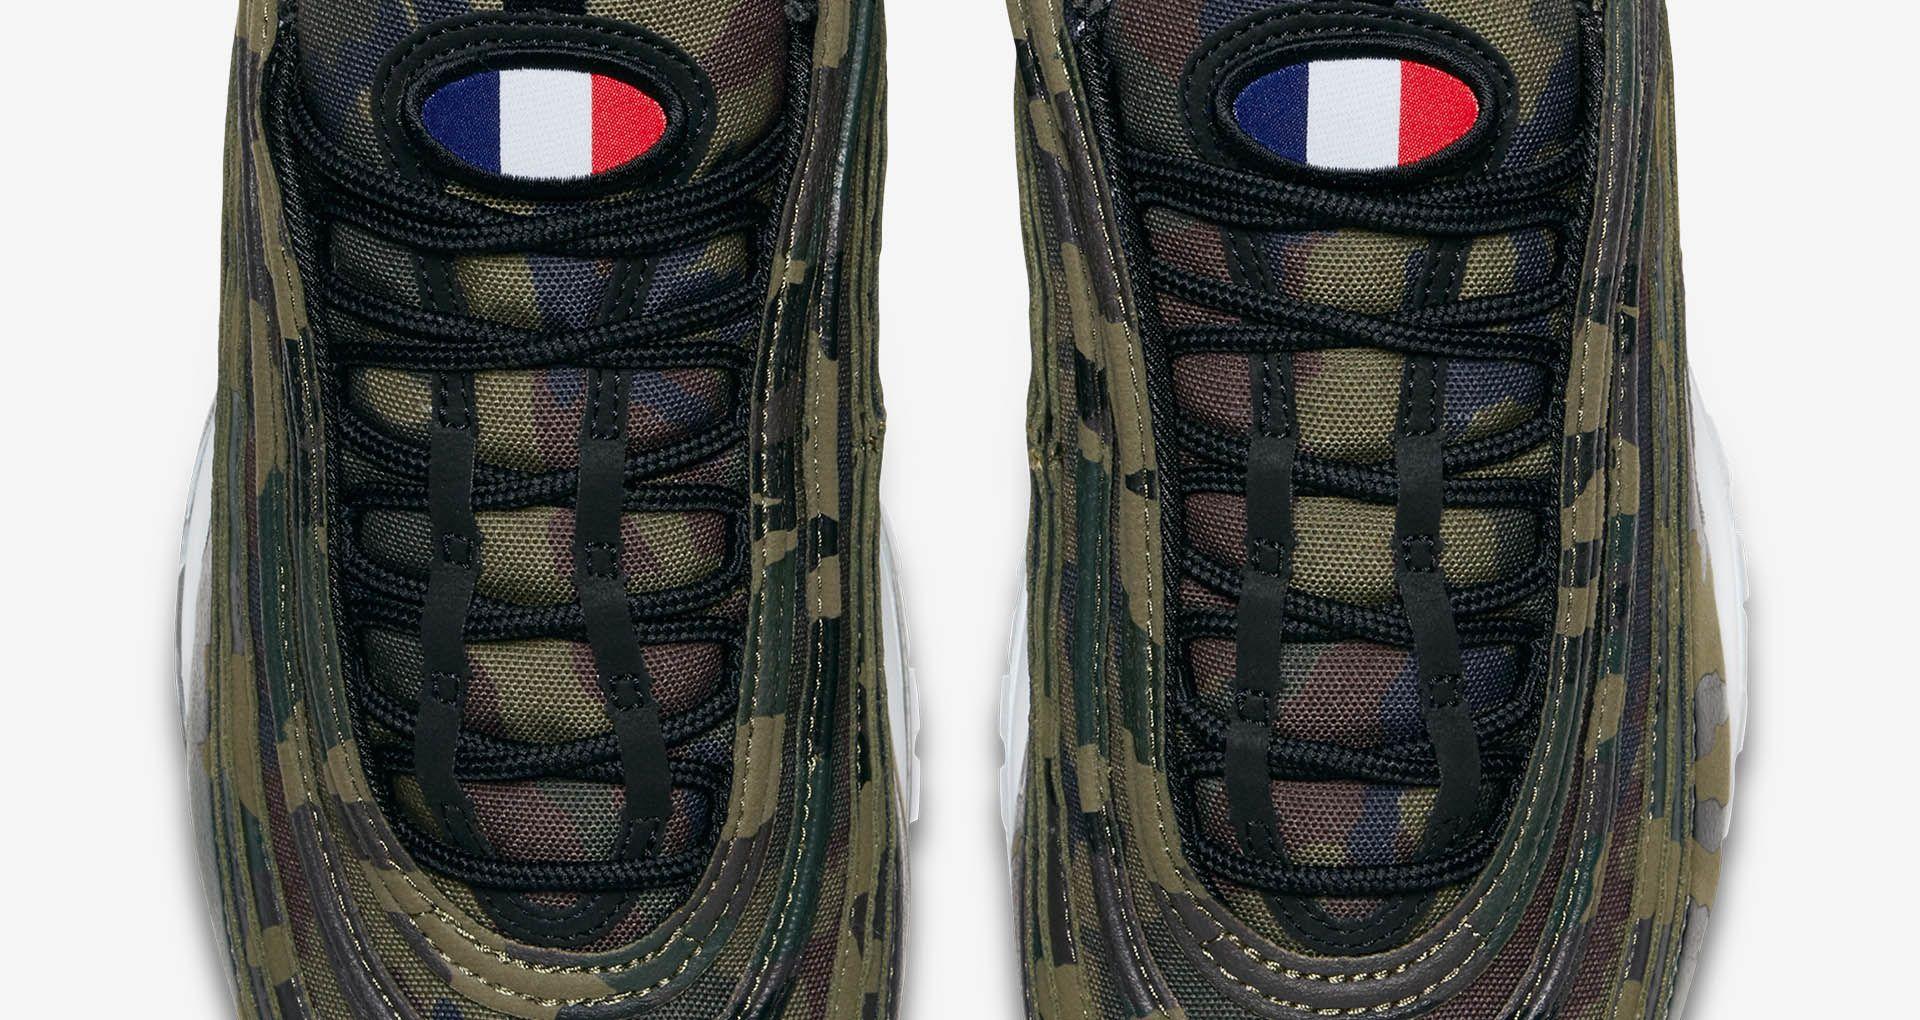 acheter en ligne 05978 8d066 Nike Air Max 97 Premium 'France' Release Date. Nike+ Launch GB